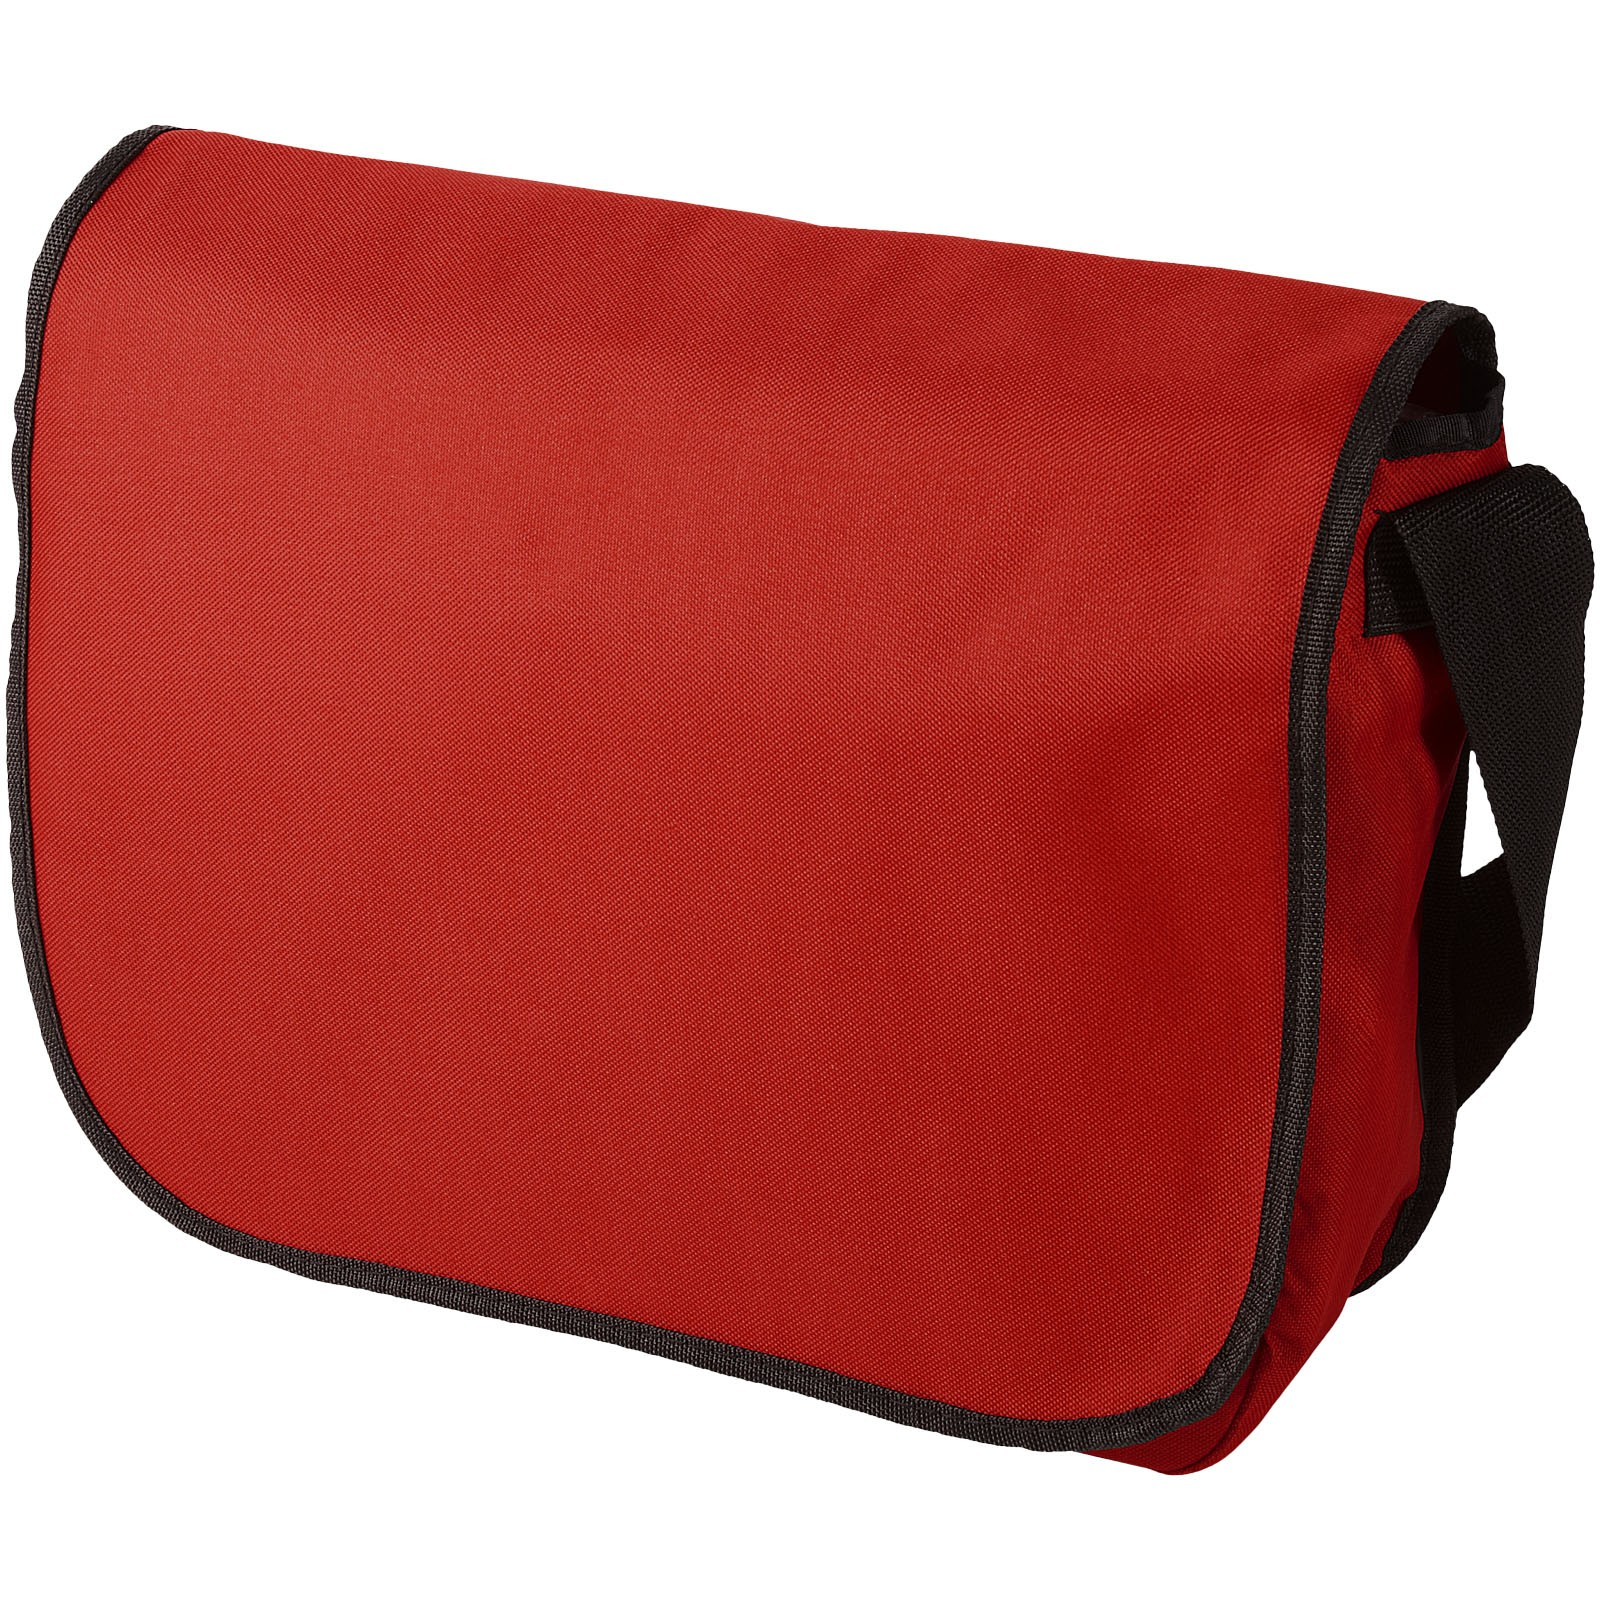 Malibu Umhängetasche - Rot